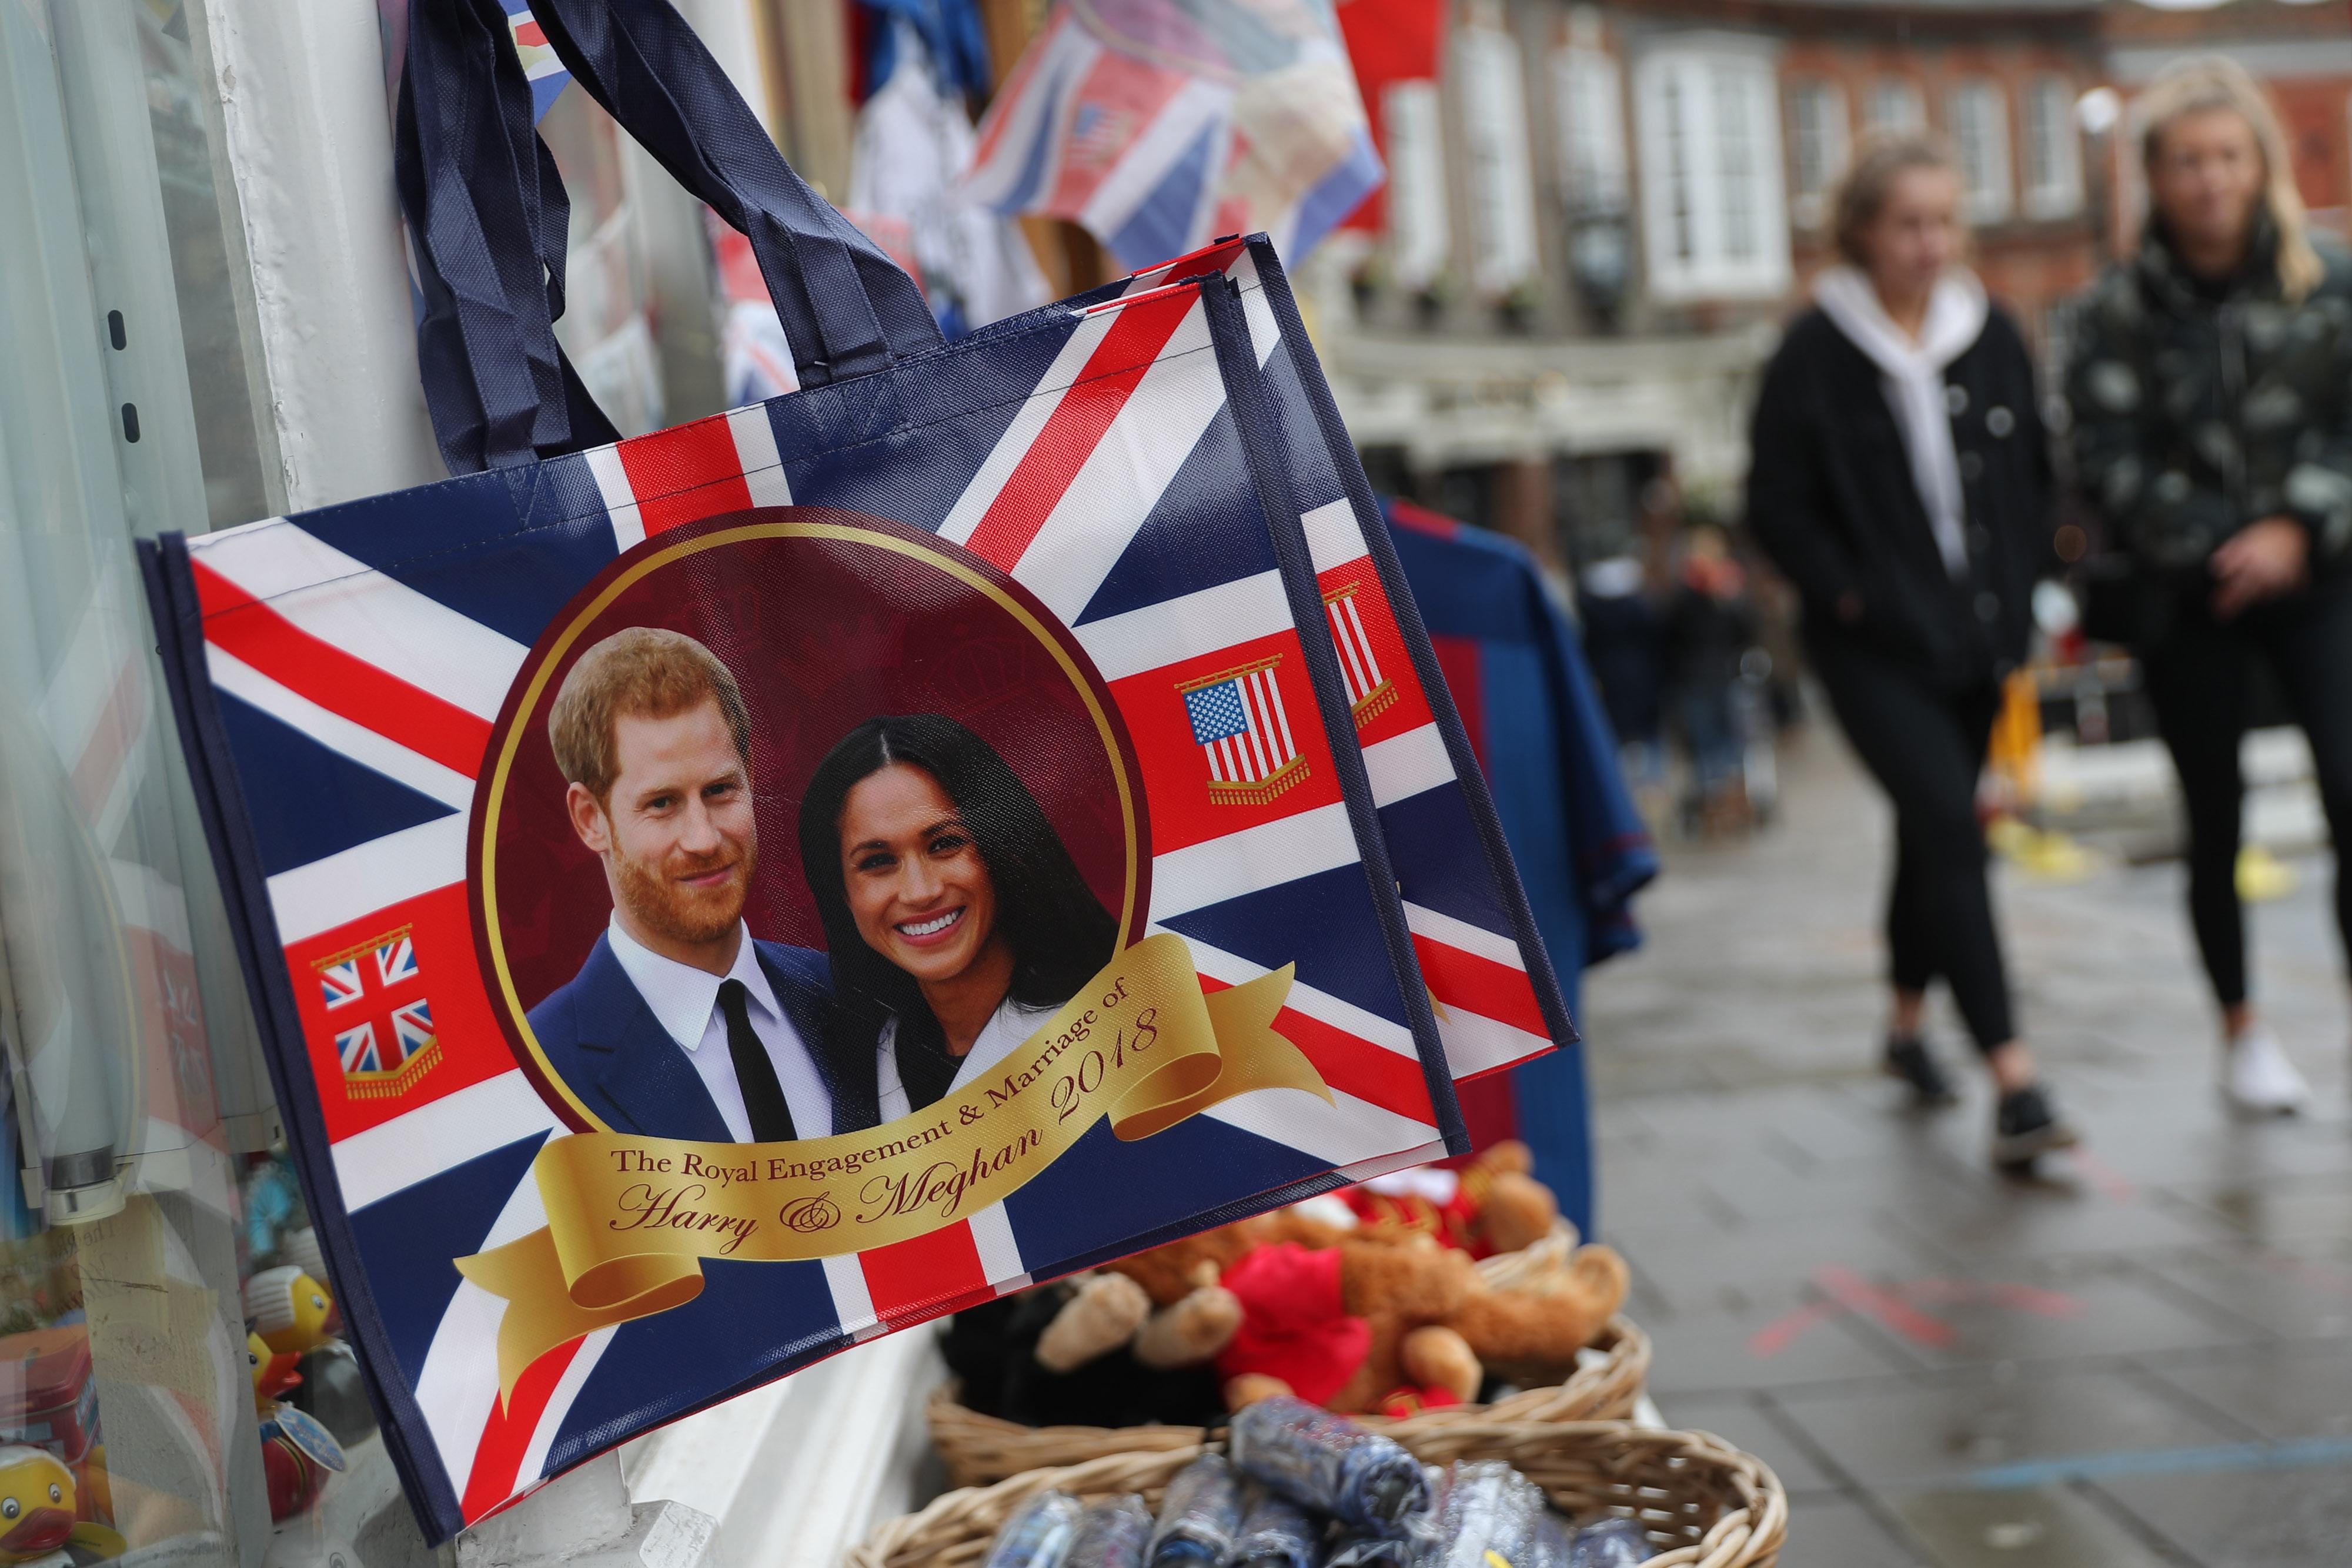 memorabilia commemorating the Royal Wedding